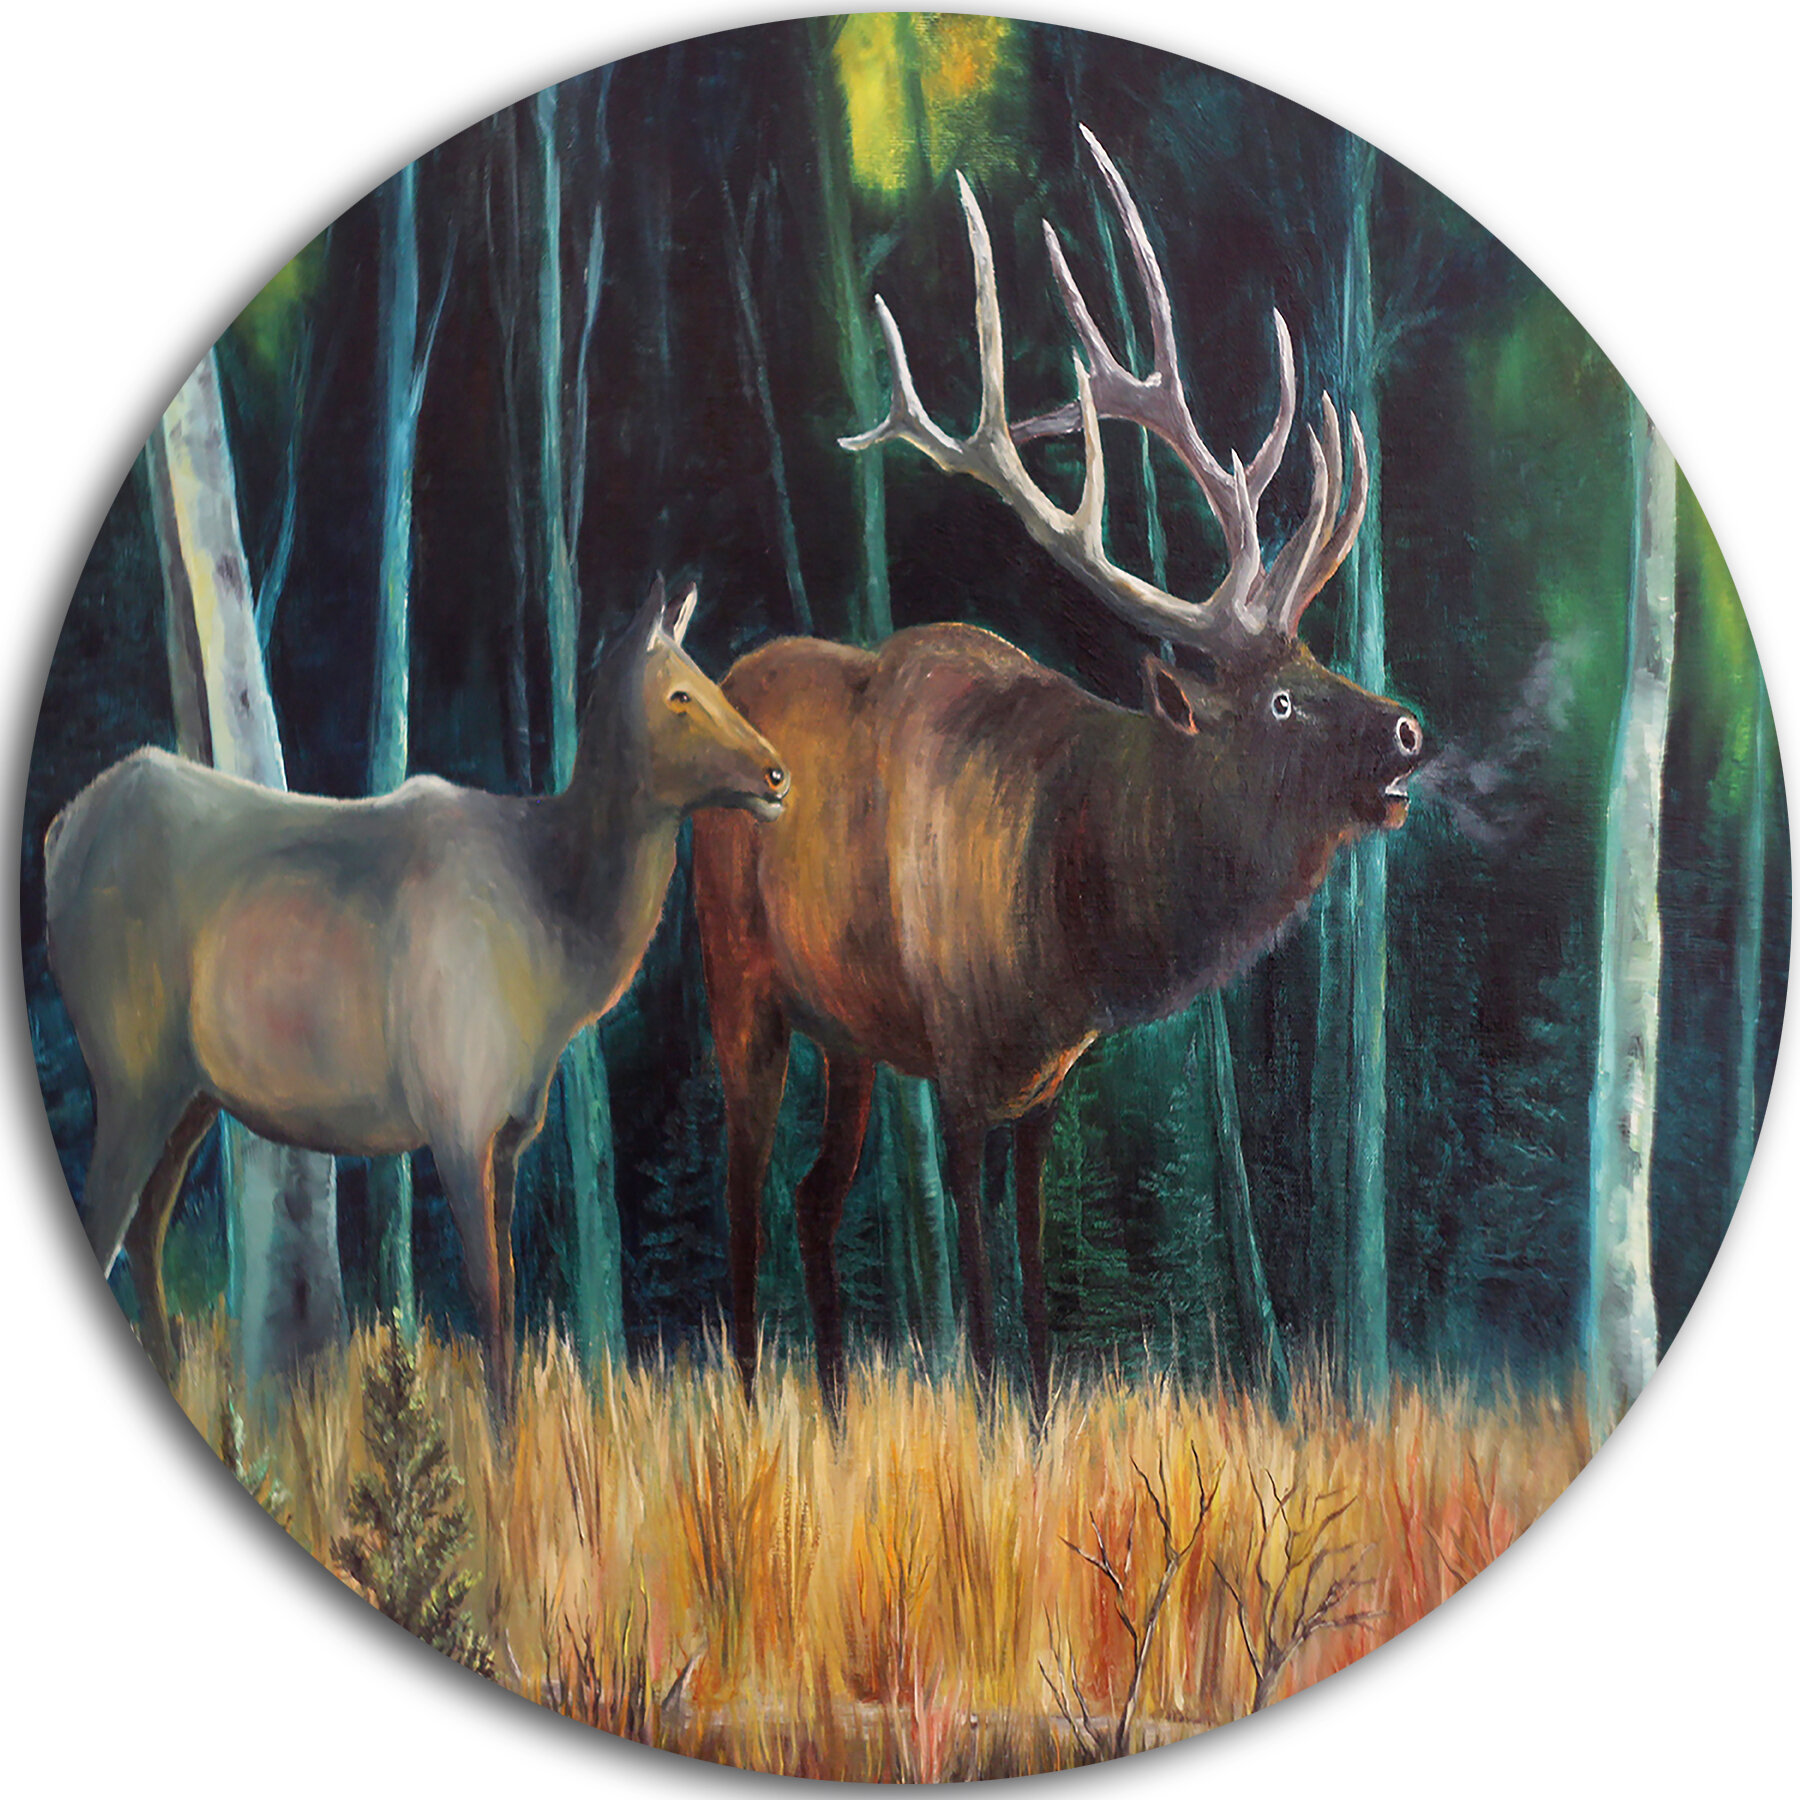 Designart Wandering Deer In Forest Graphic Art Print On Metal Wayfair